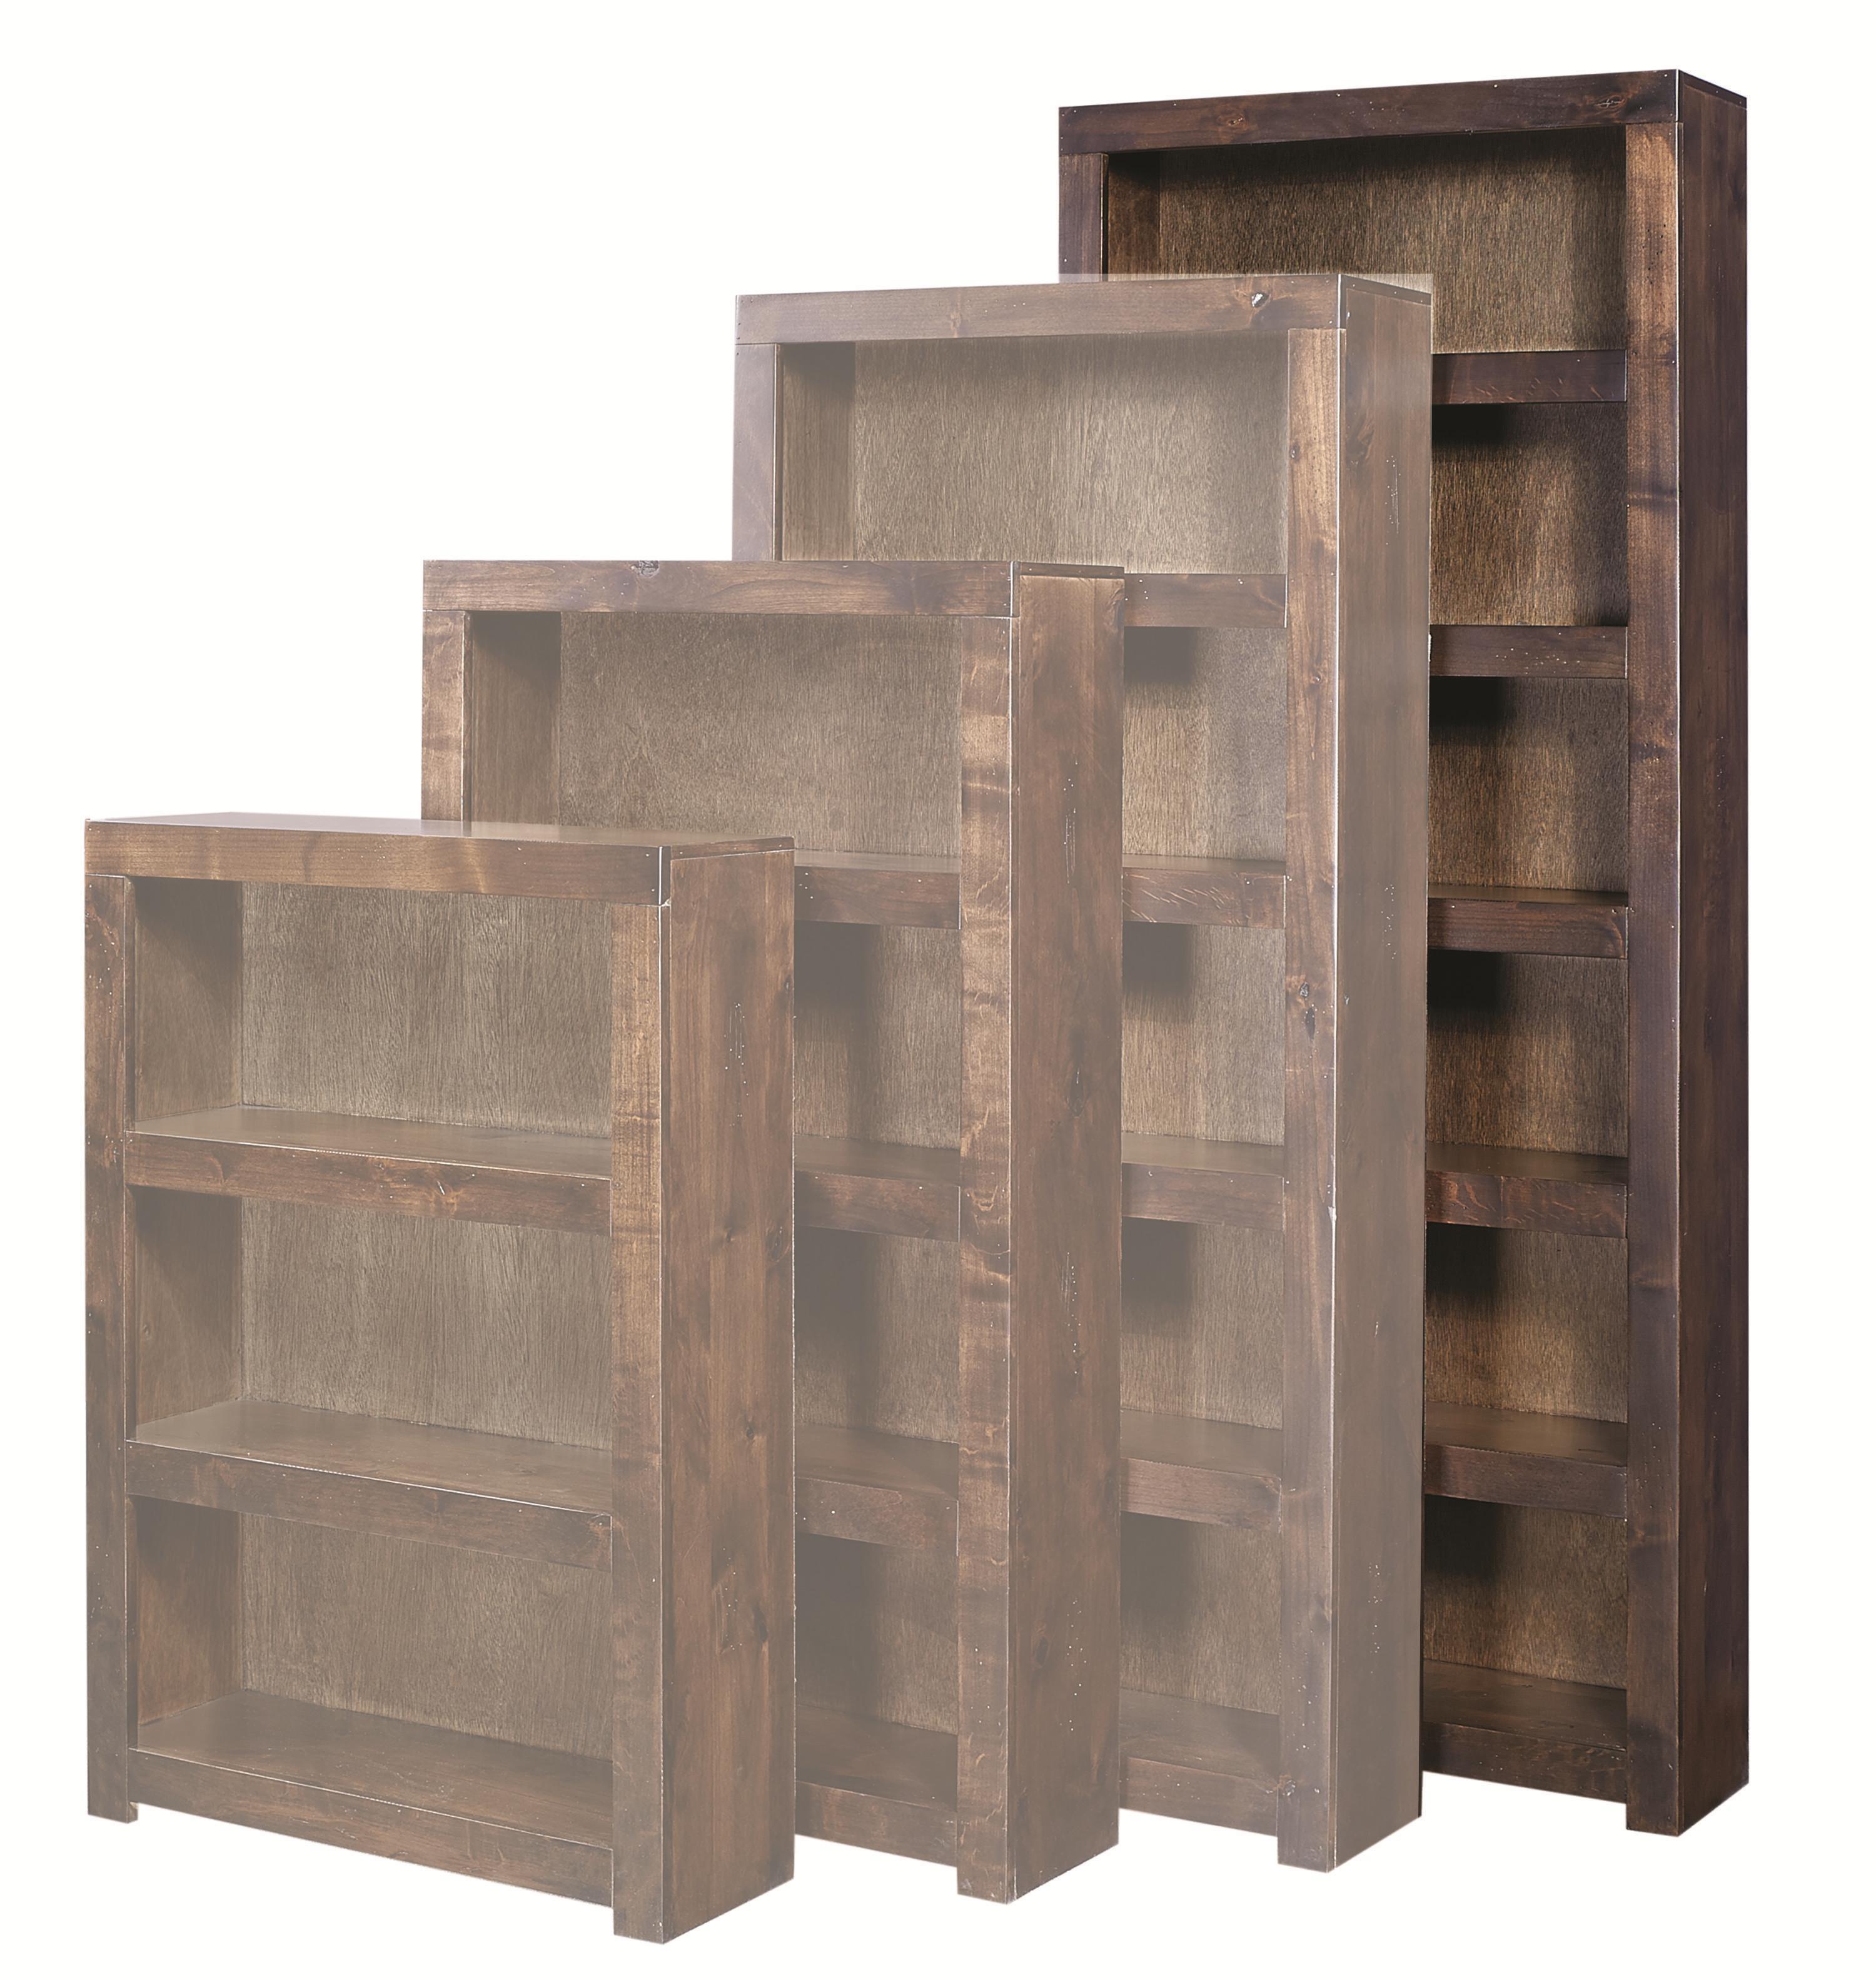 Aspenhome Contemporary Alder 84 Inch Bookcase - Item Number: DL3484-TOB